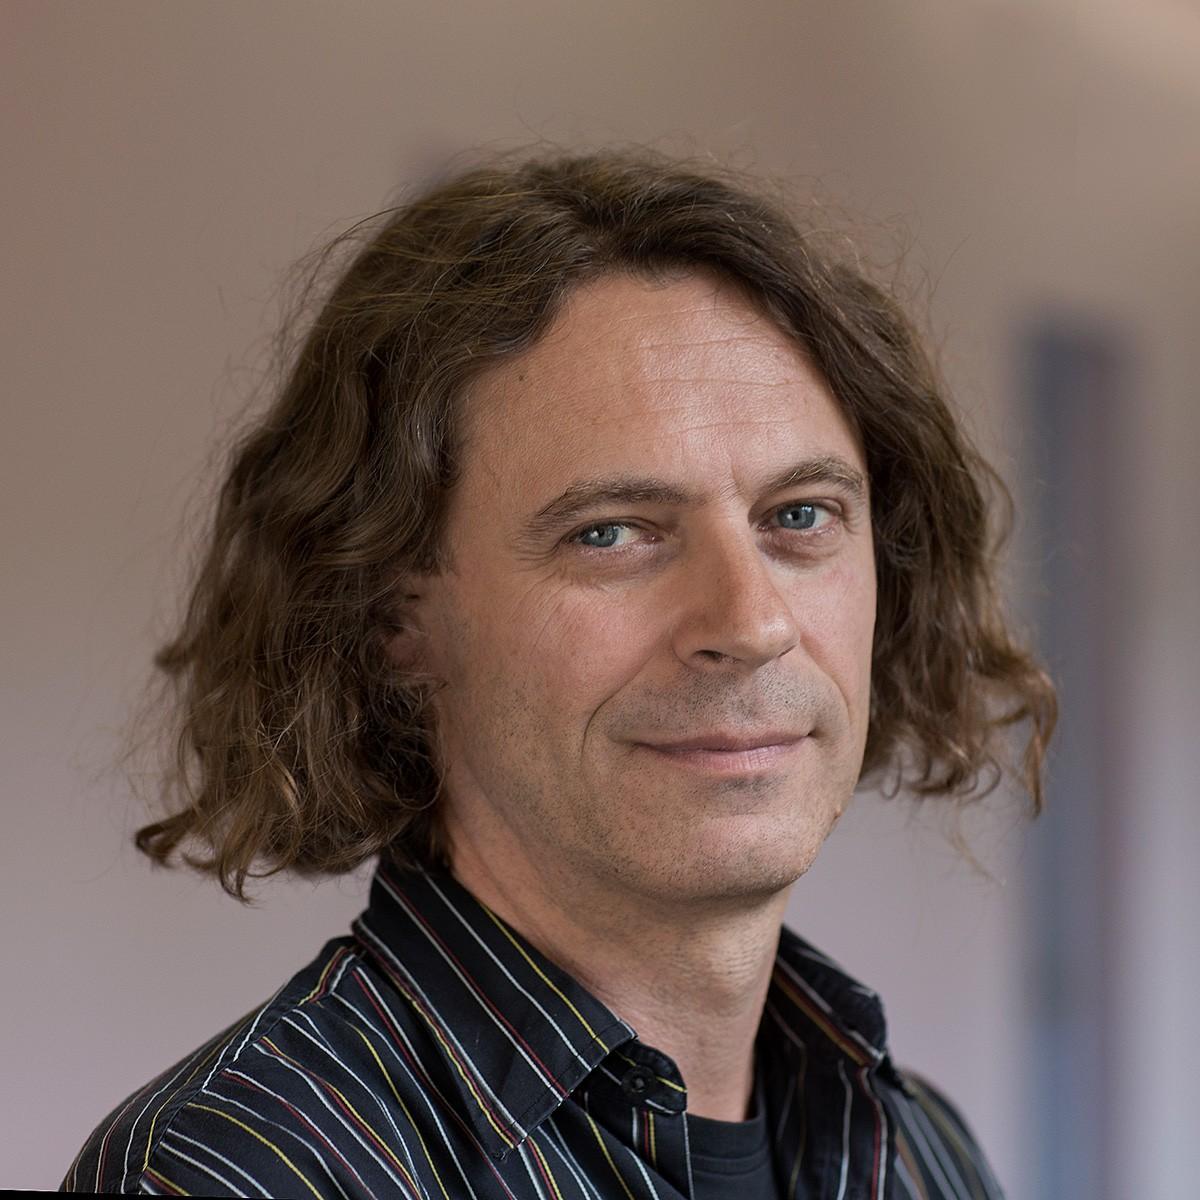 Porträt Arno Riedl